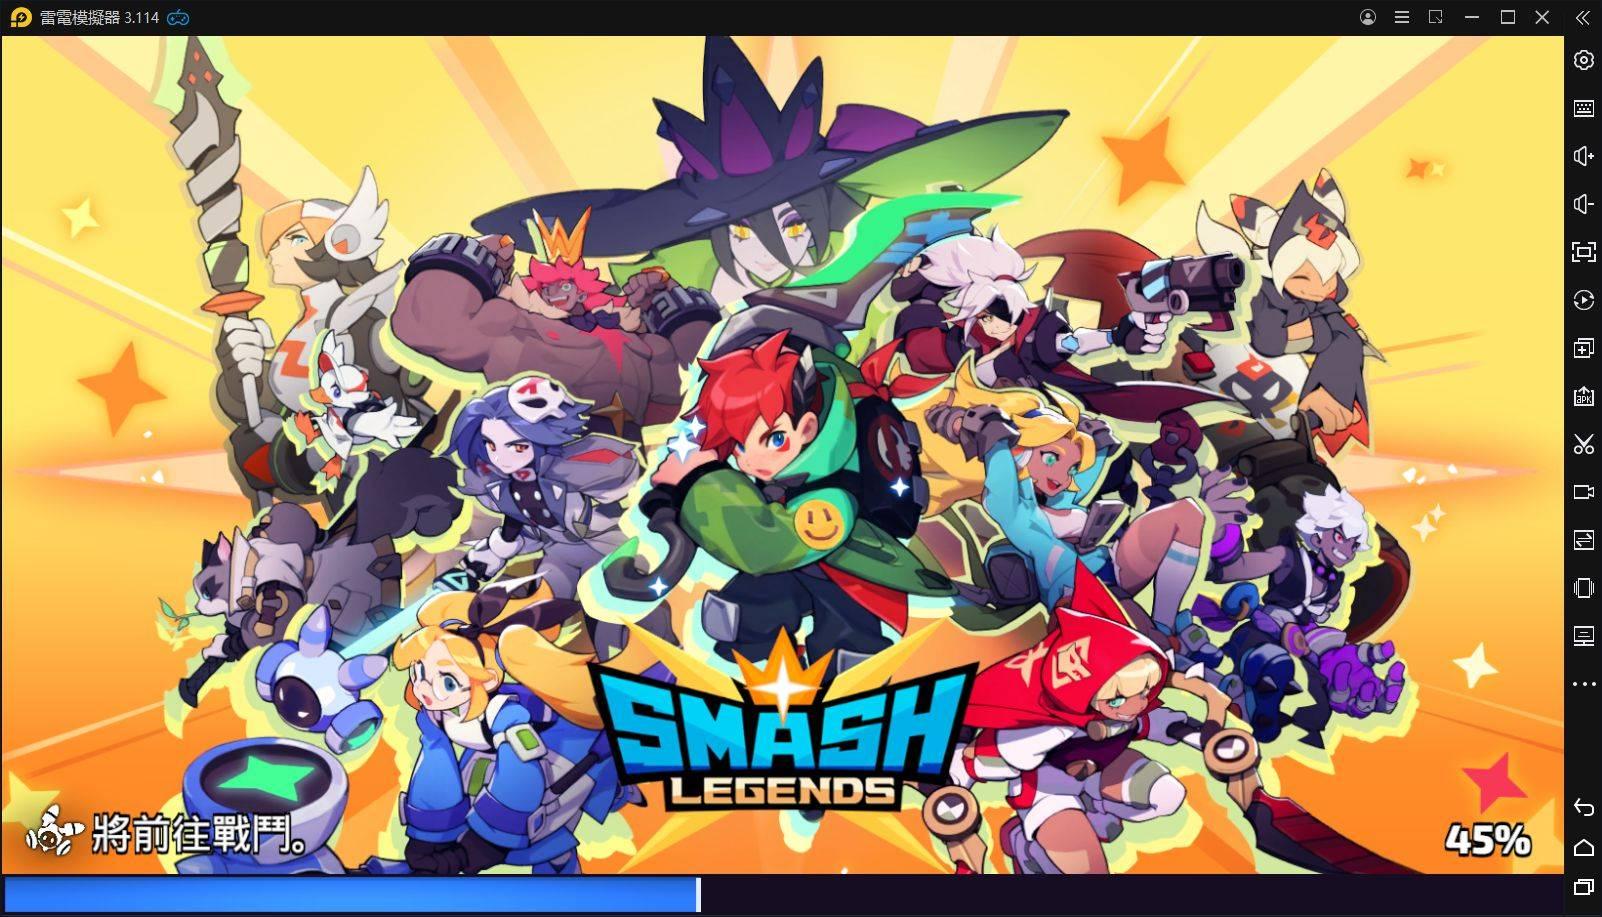 SMASH LEGENDS:傳奇大亂鬥 即時動作遊戲